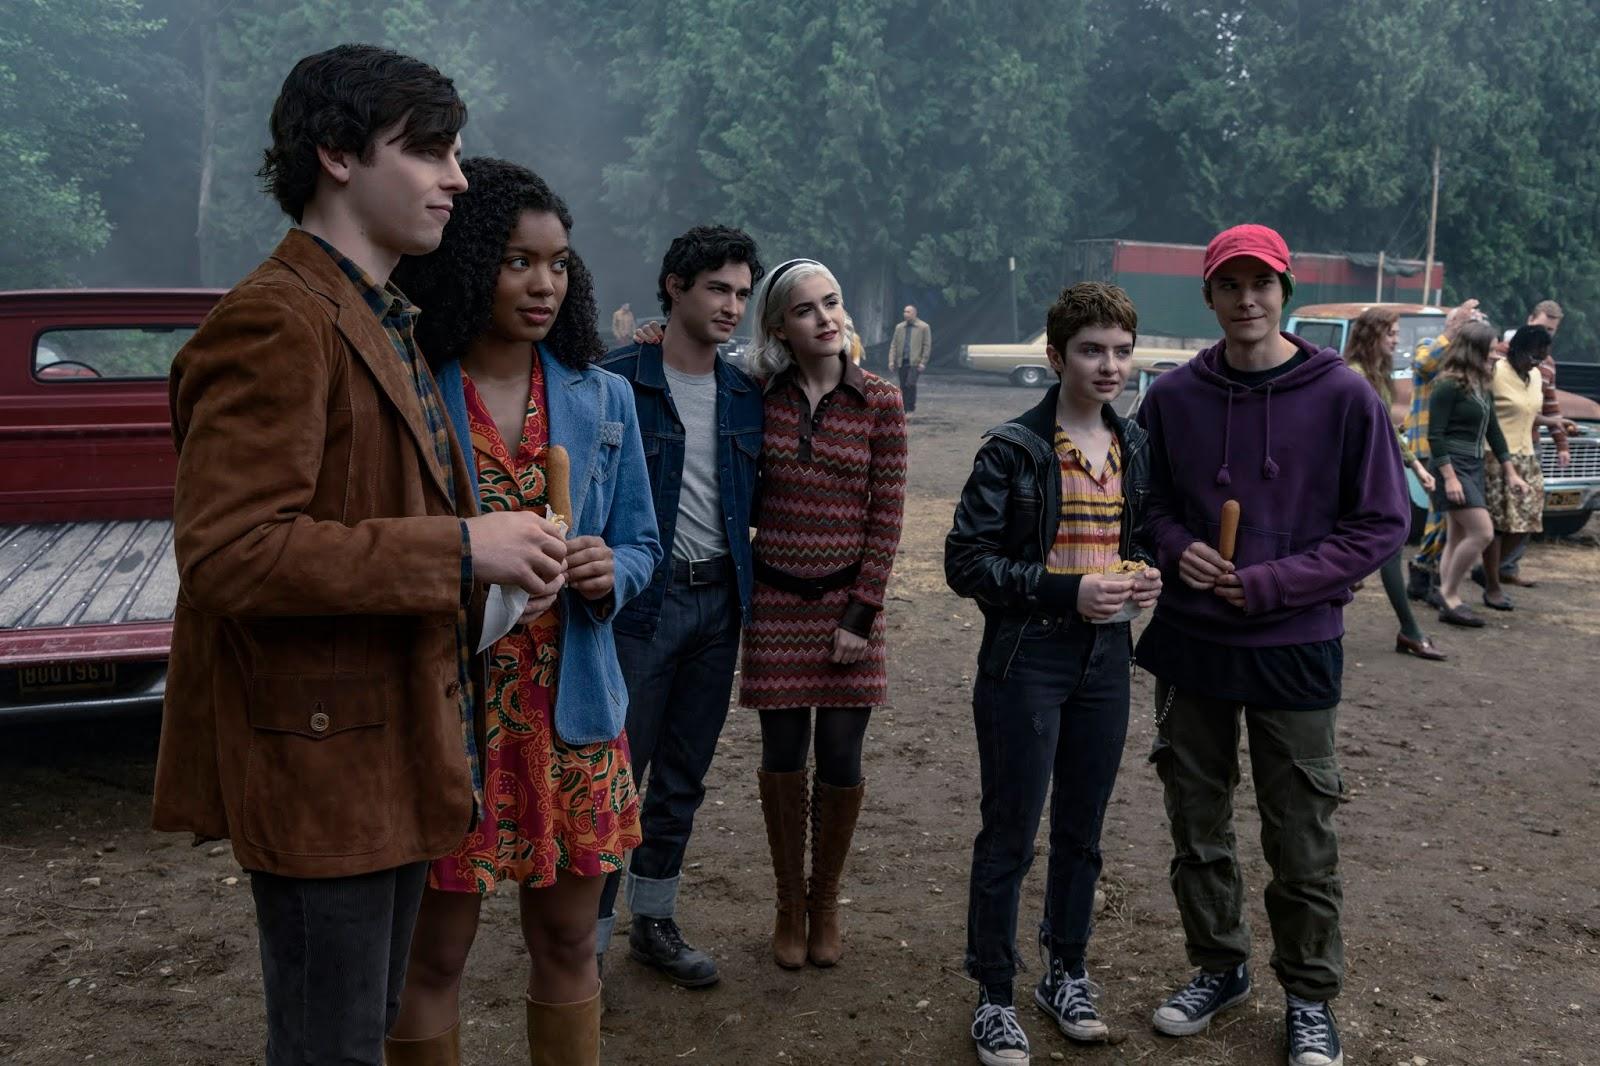 chilling adventures of sabrina, sezon 3, netflix, recenzja serialu